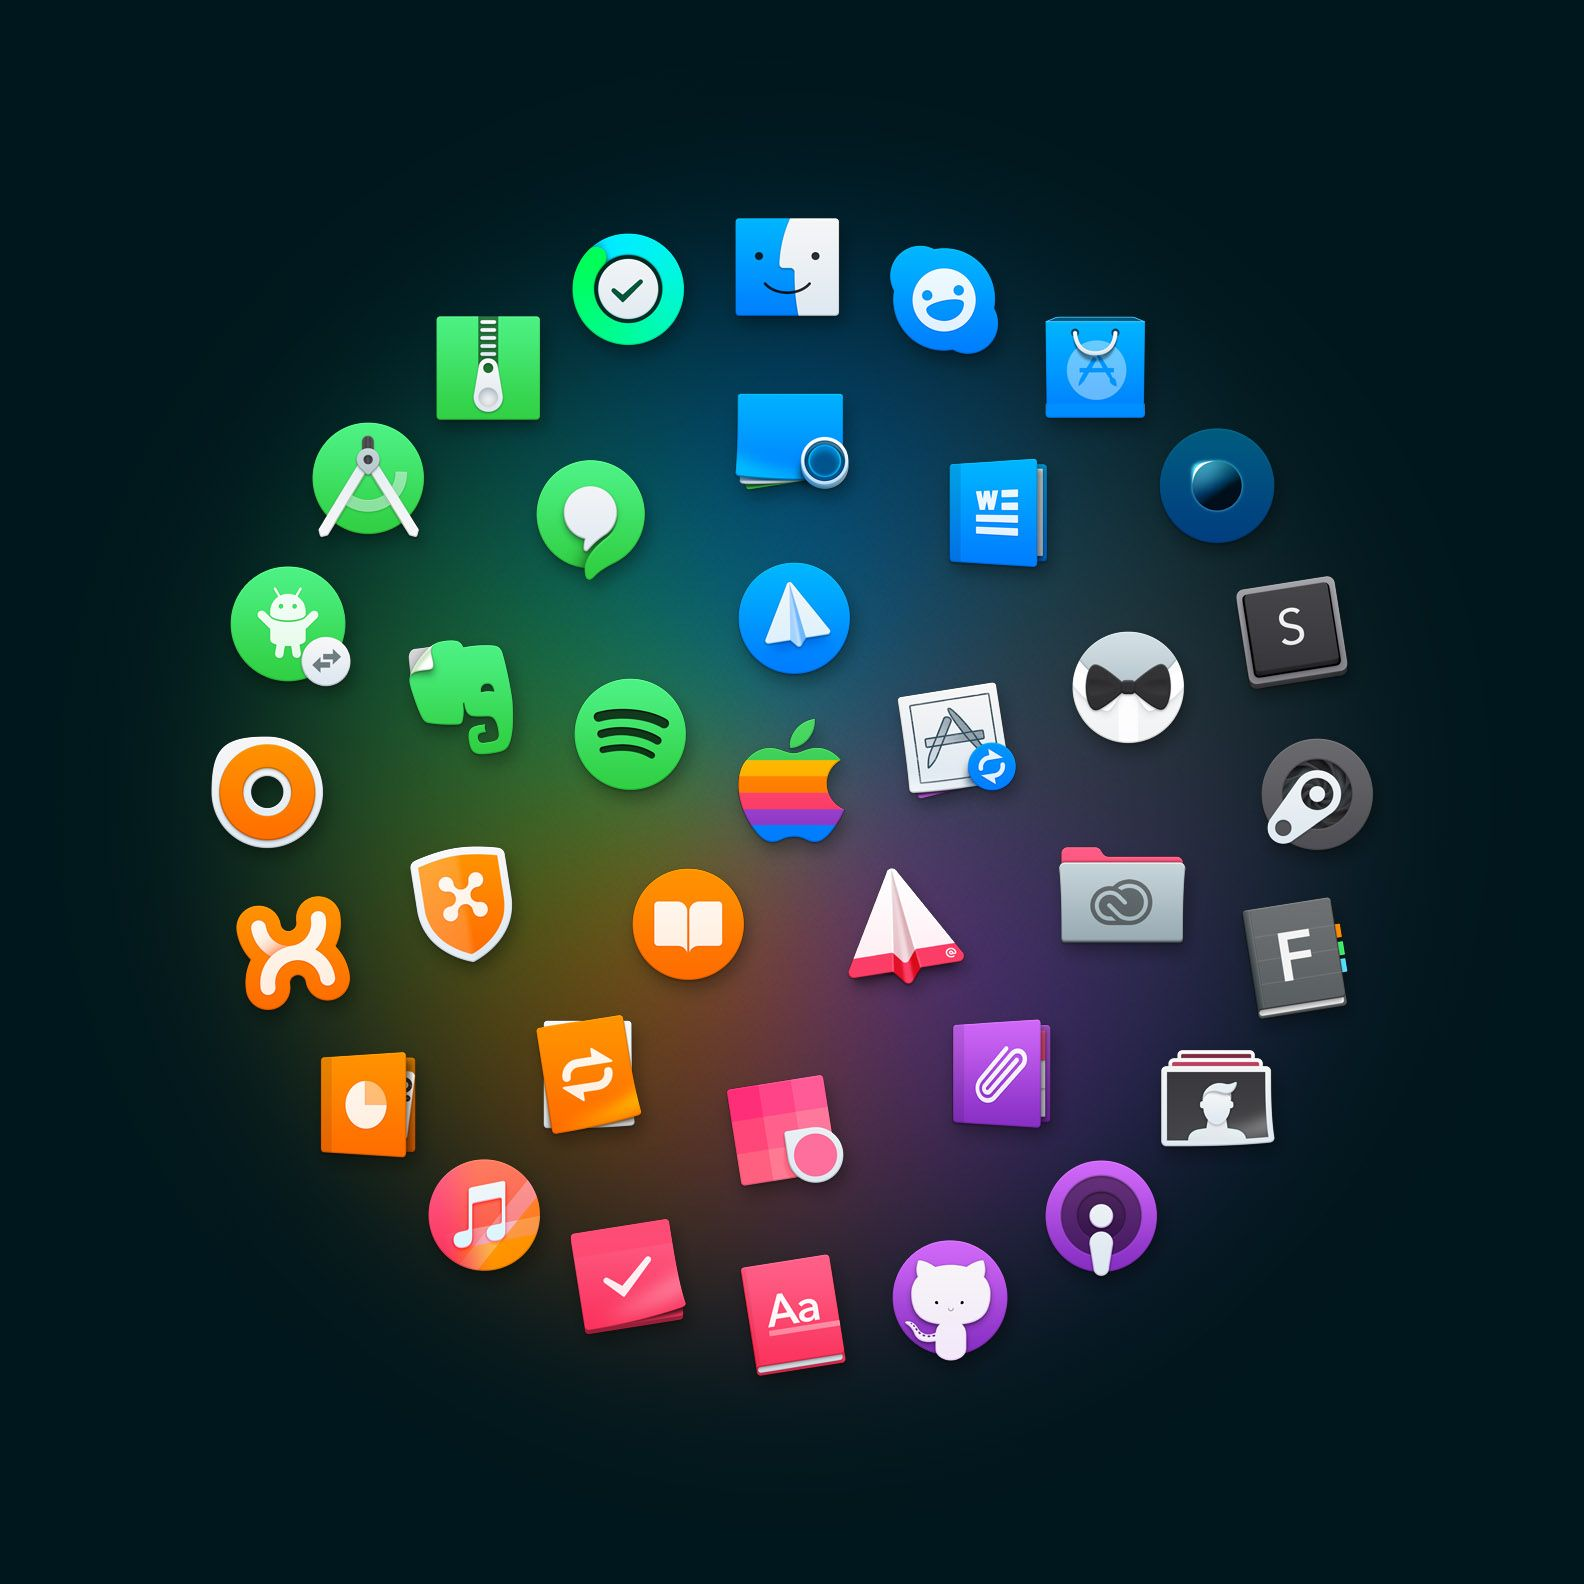 Icon Set for macOS (60 Icons) アイコン